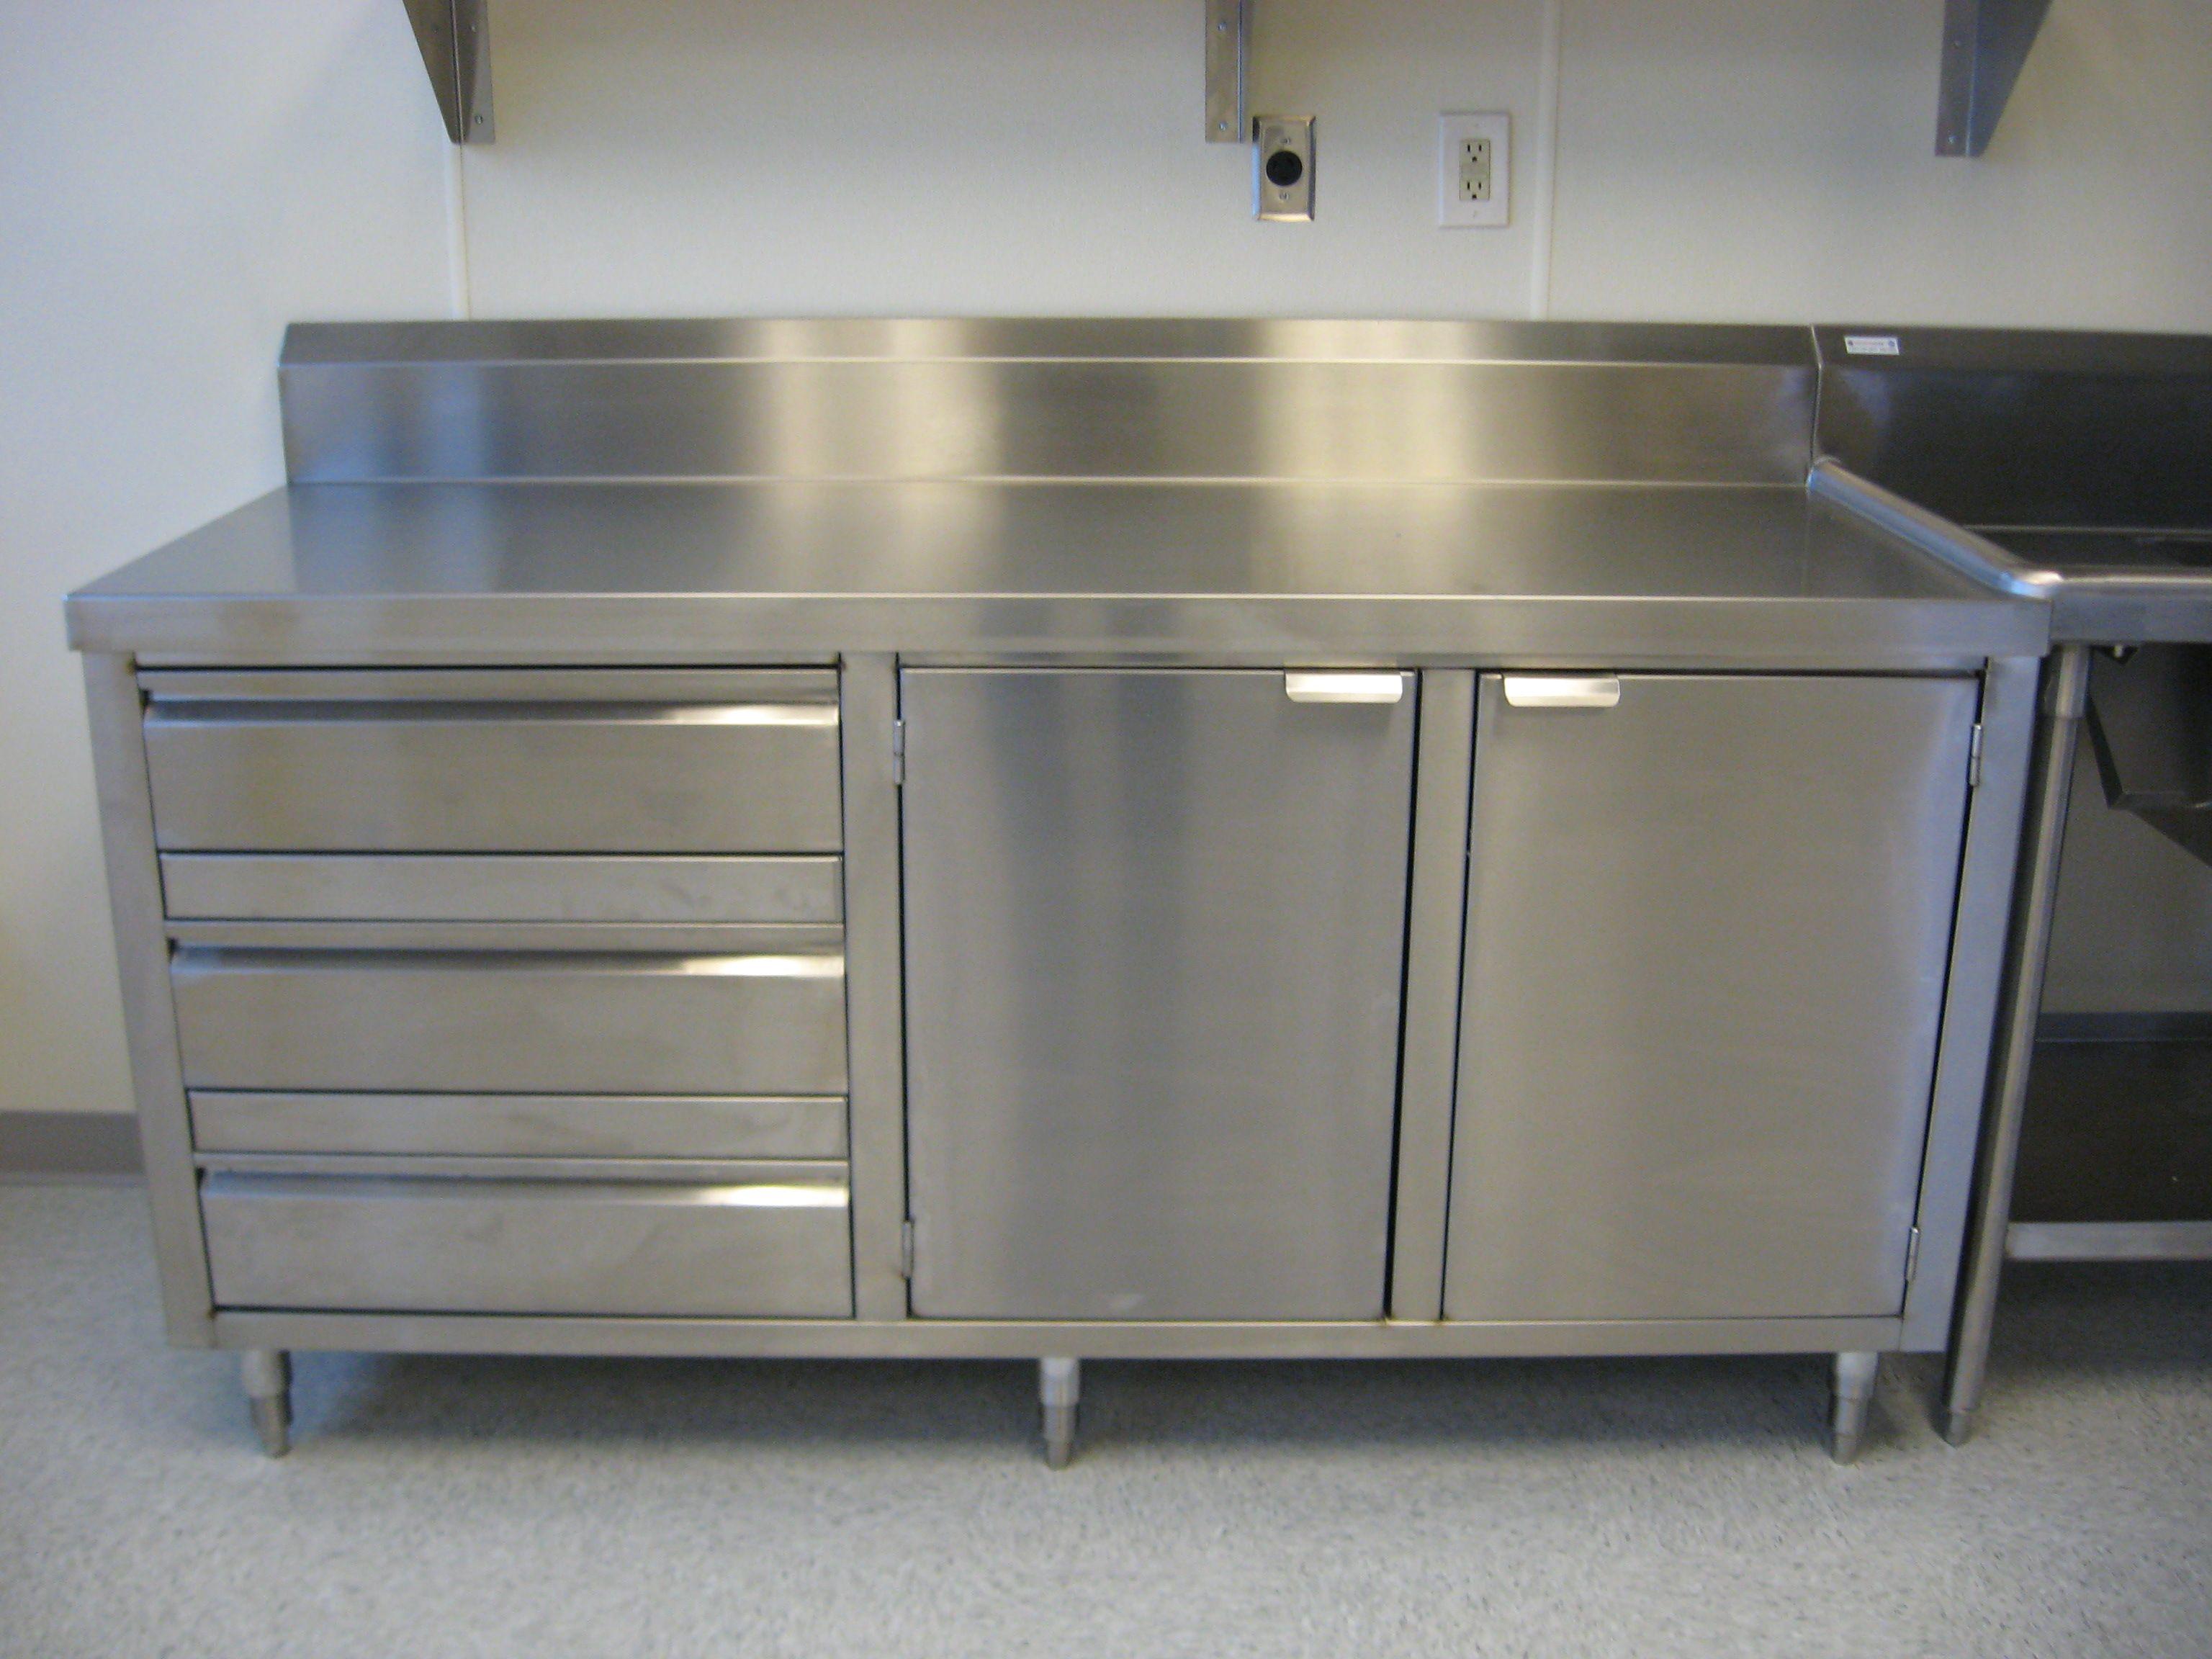 Beautiful Stainless Steel Kitchen Cabinet Doors Metal Kitchen Cabinets Stainless Steel Kitchen Cabinets Steel Kitchen Cabinets